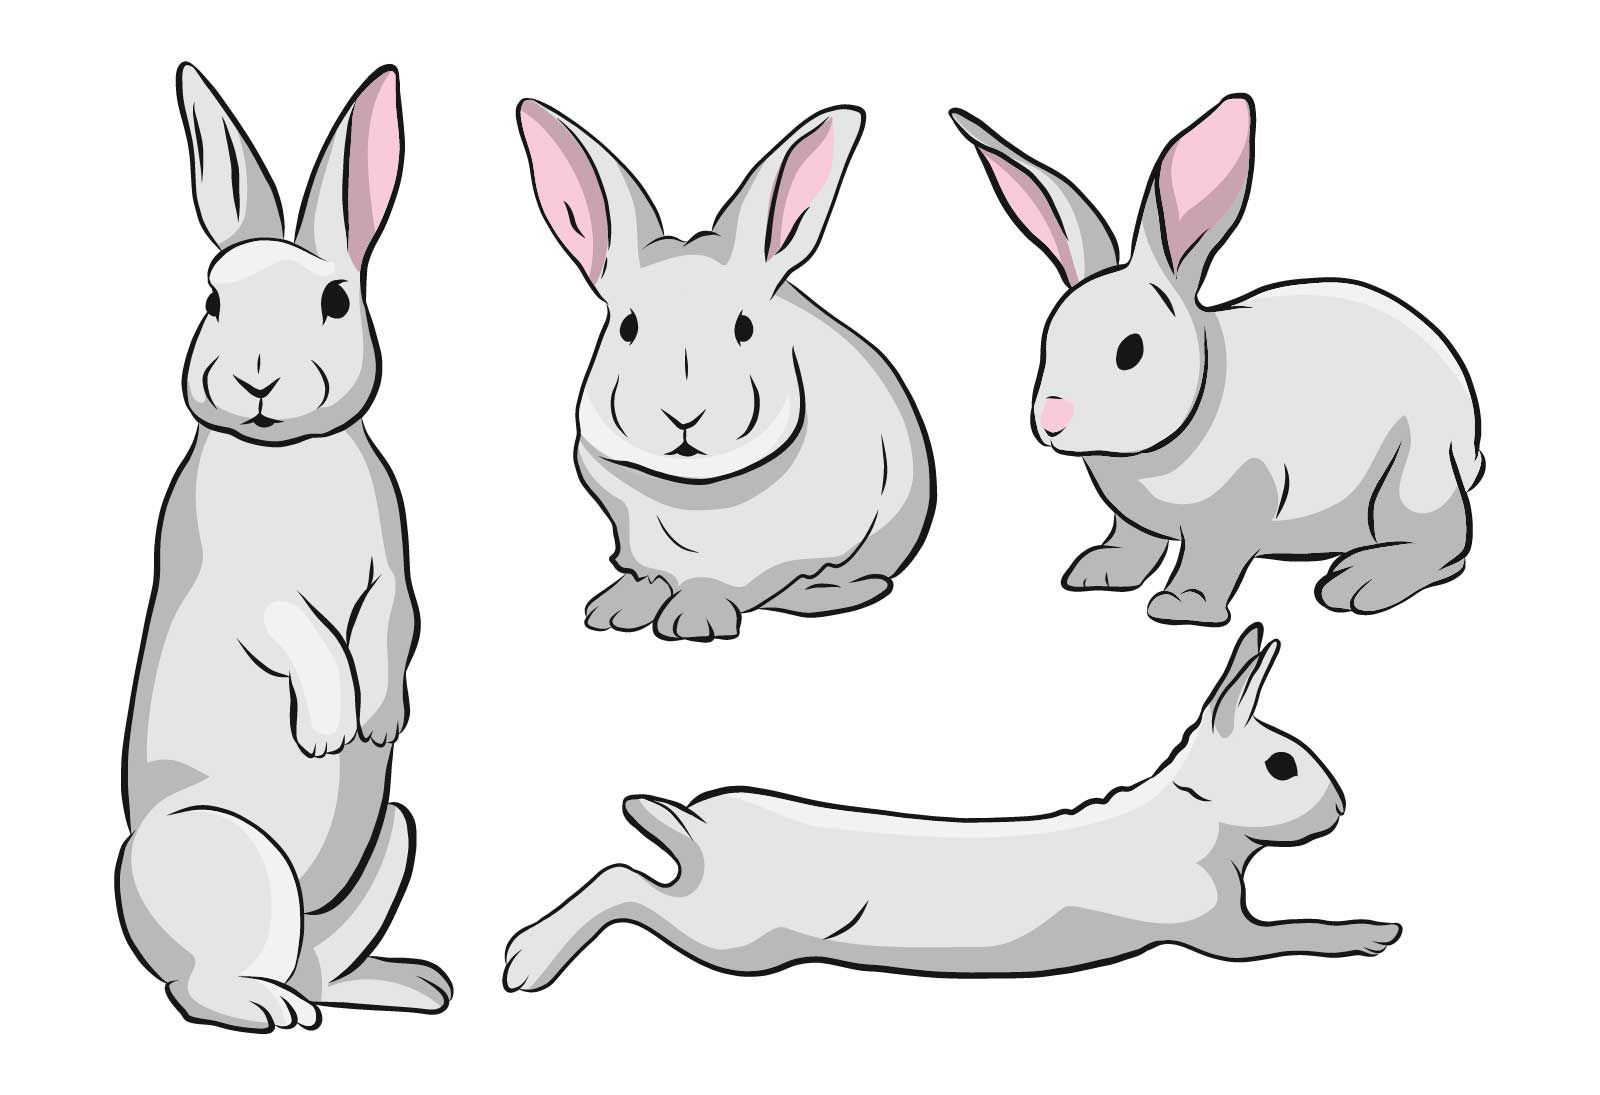 Cute Rabbit Illustration Set